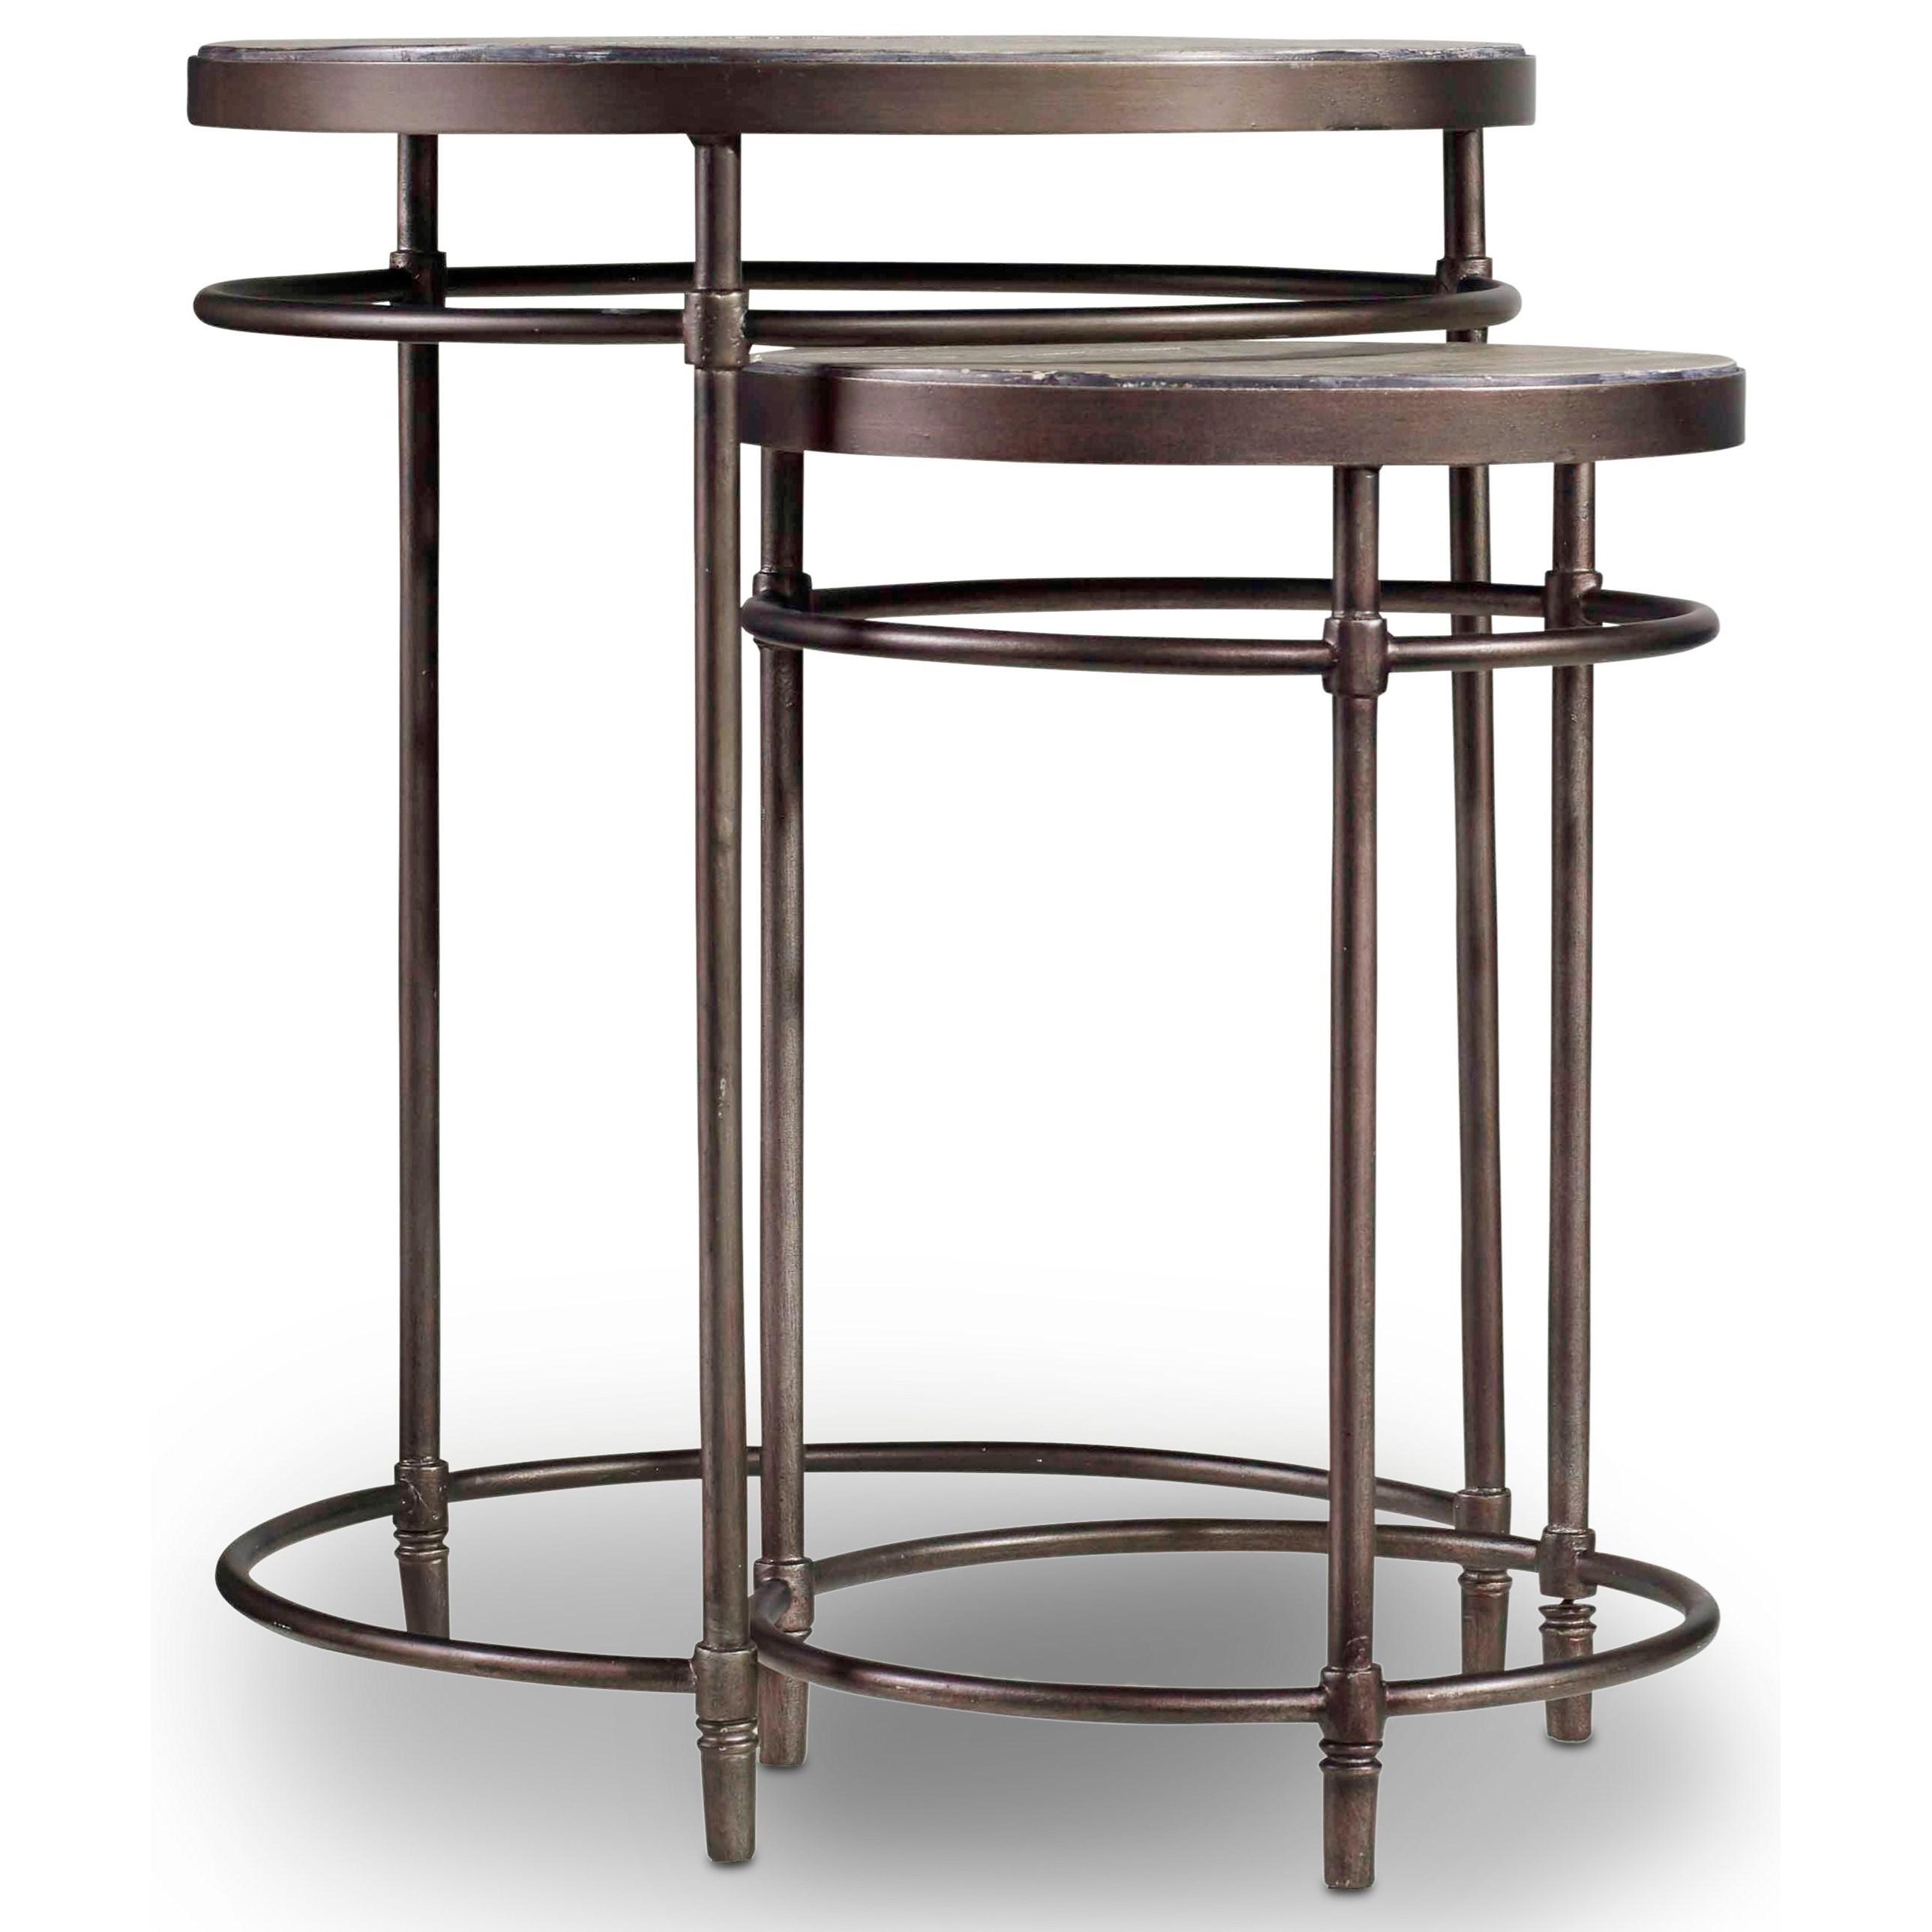 Hooker Furniture Saint Armand Nest of Tables - Item Number: 5601-50001